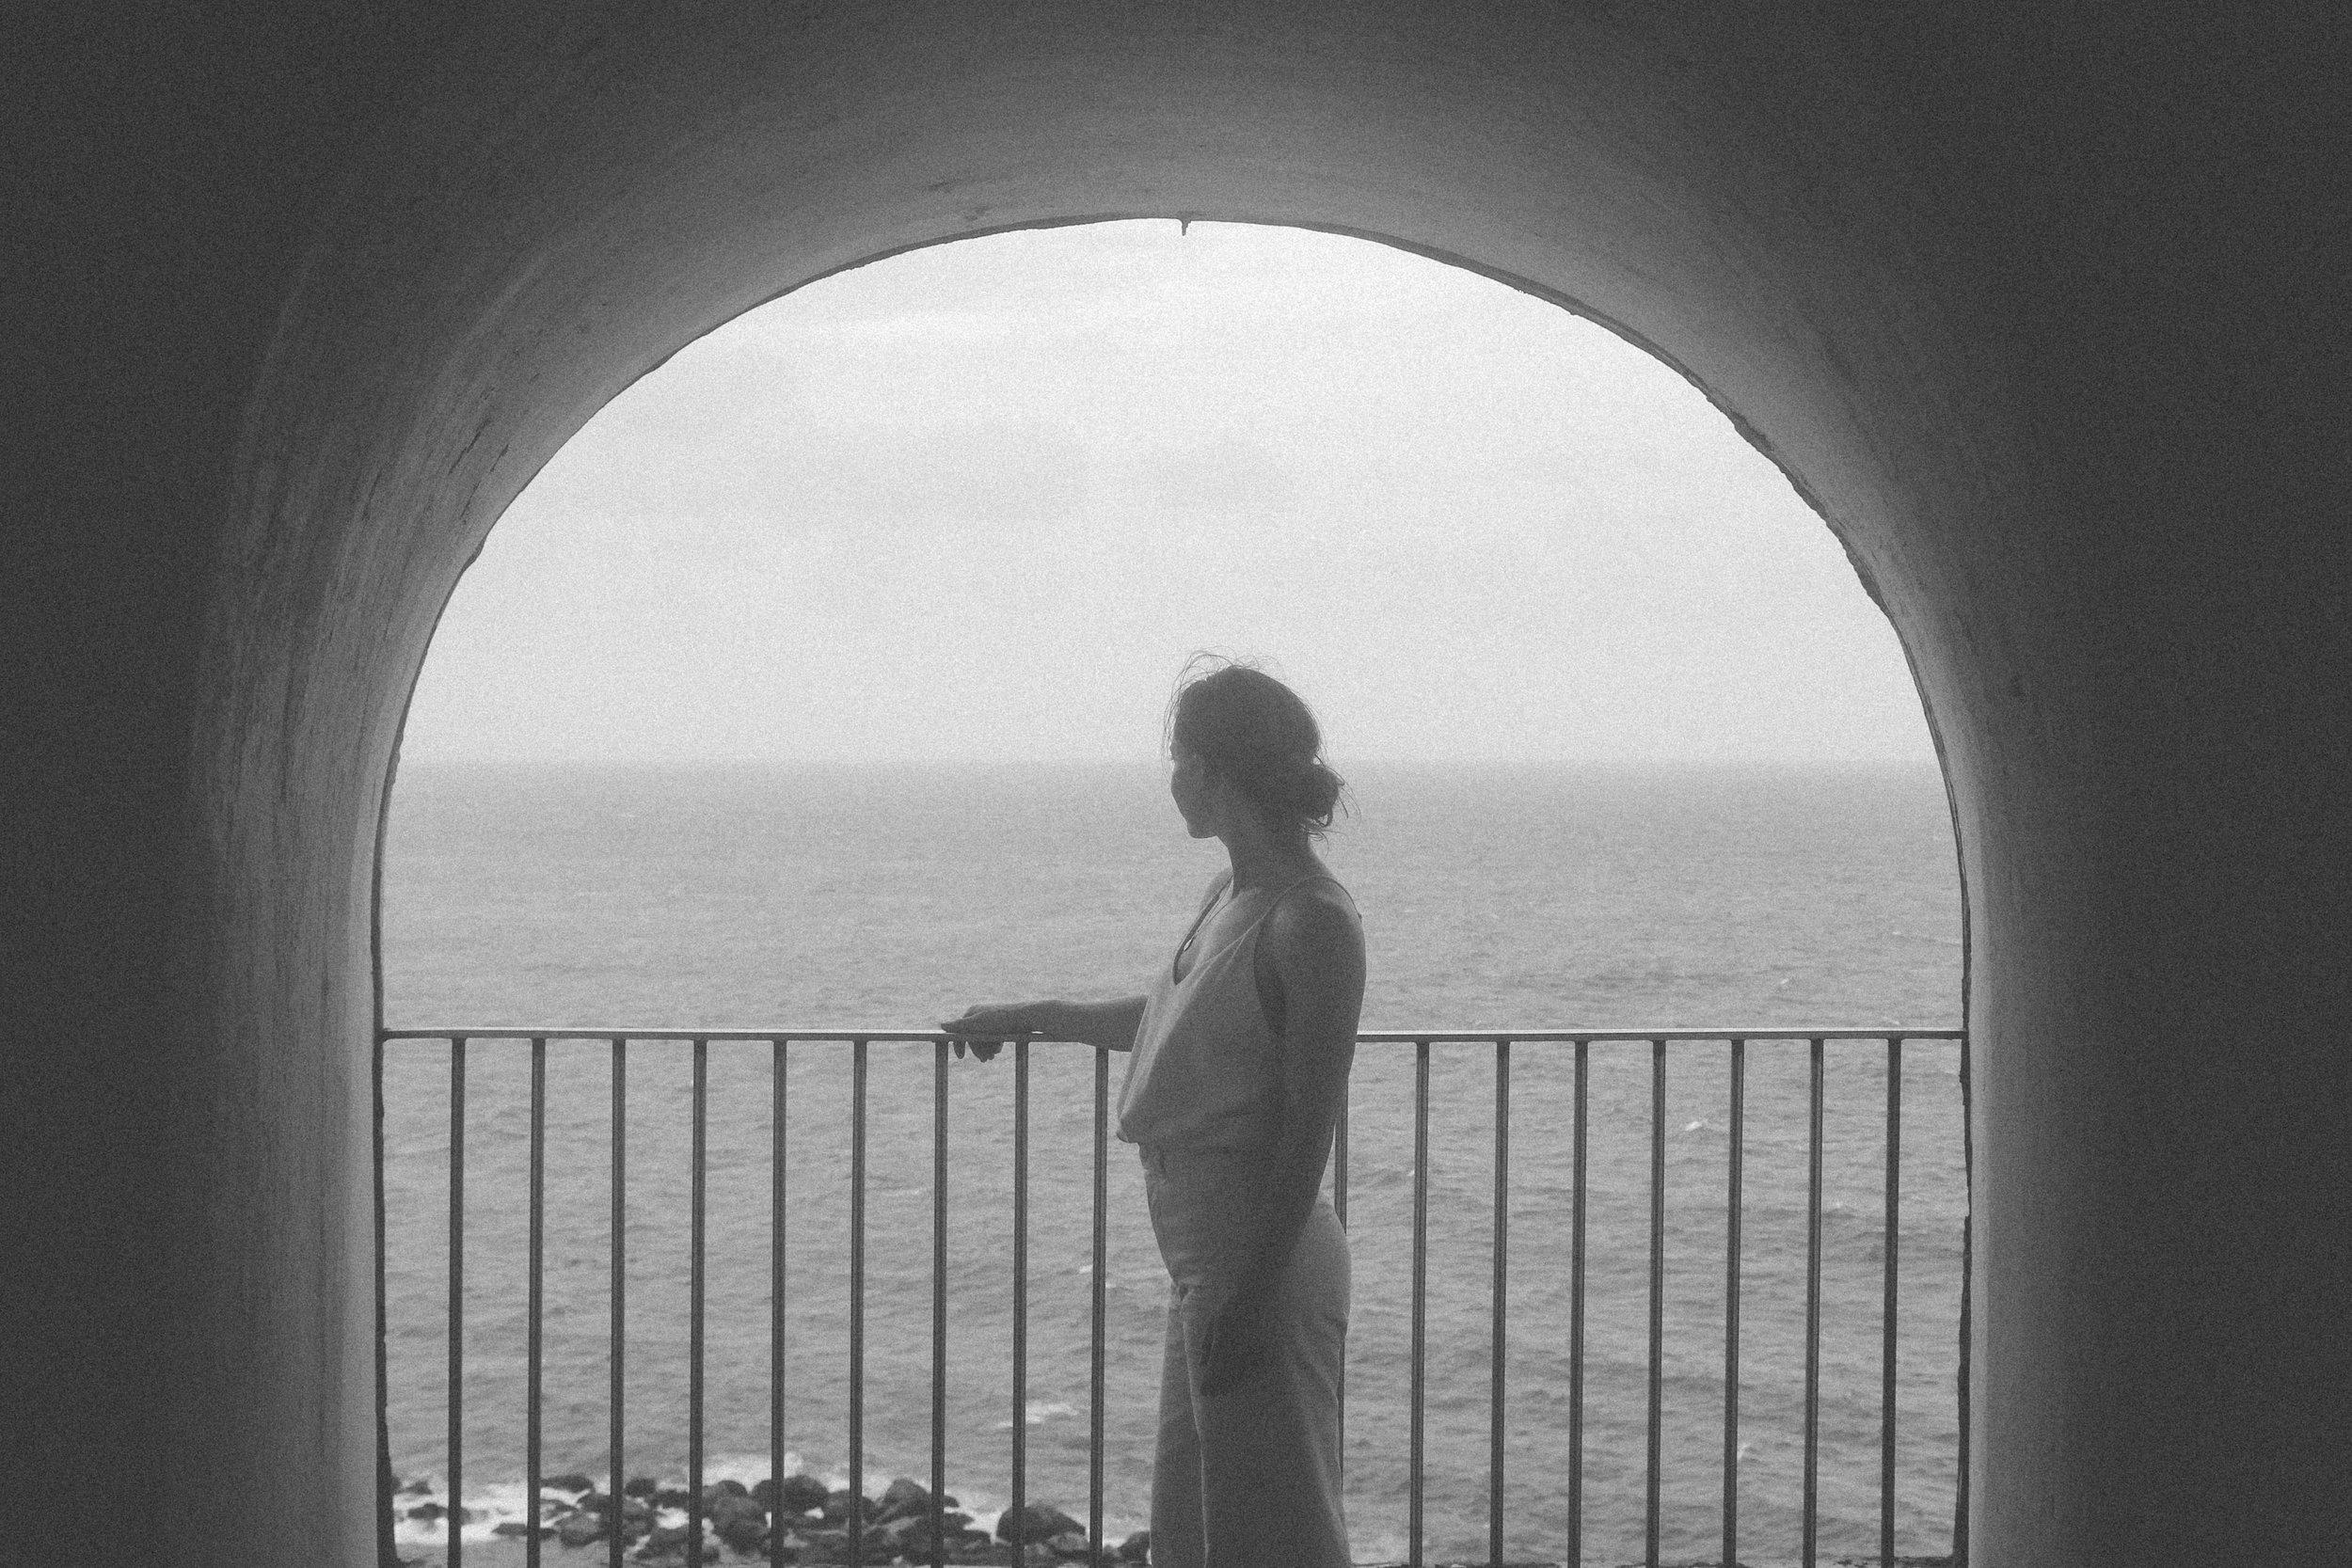 SAN JUAN, PUERTO RICO TRAVEL DIARY | TAYLORKRISTIINA.COM | OZMA OF CALIFORNIA SILK NOIL CAMISOLE, JESSE KAMM SAILOR PANTS IN NATURAL, AND ATP ATELIER ROSA SANDAL.